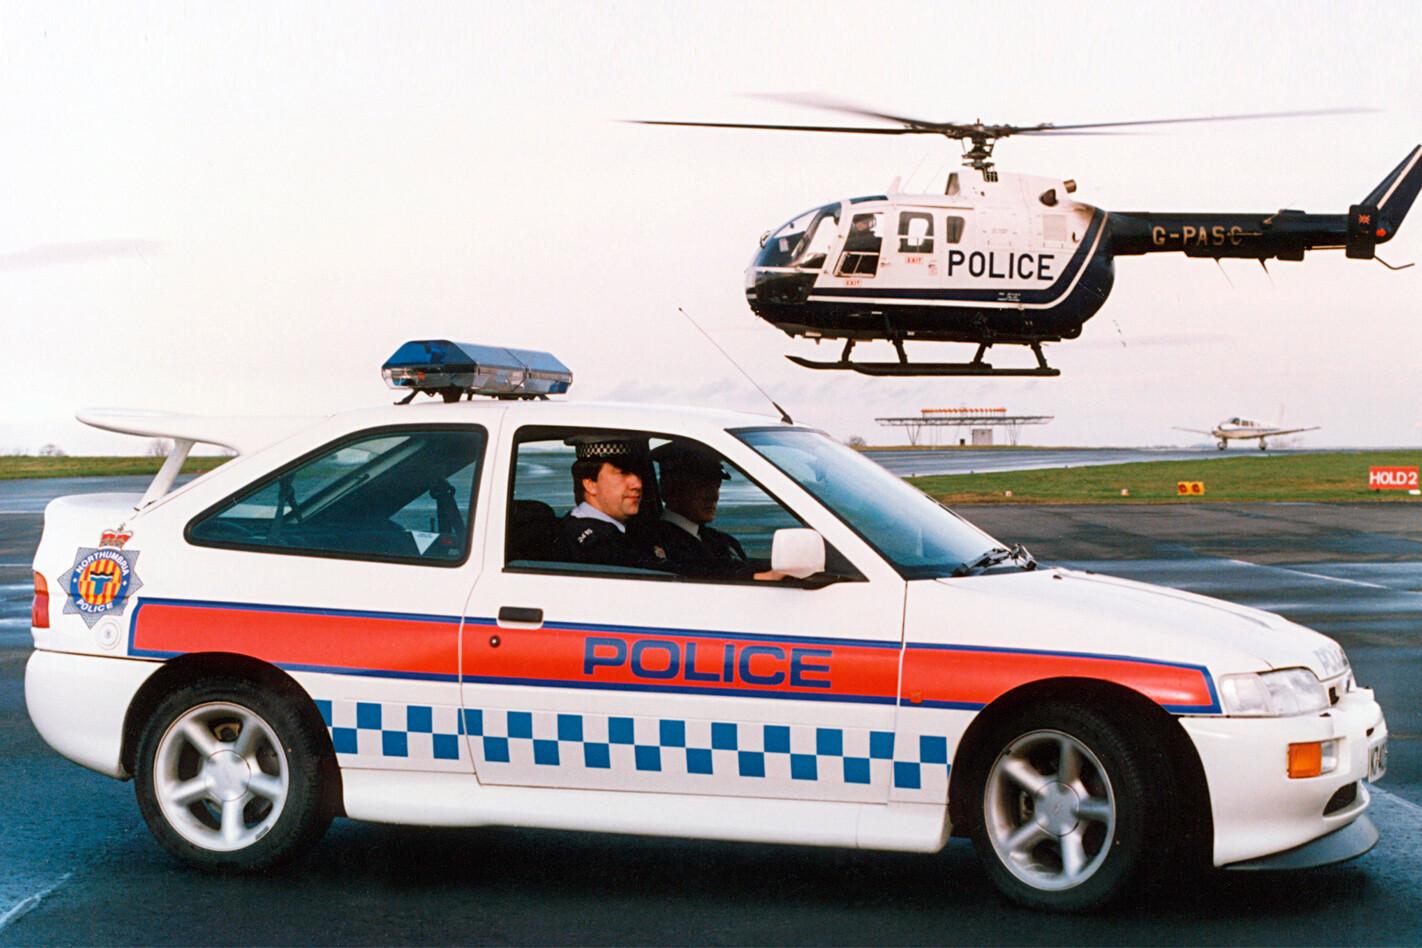 Ford Escort Cosworth police